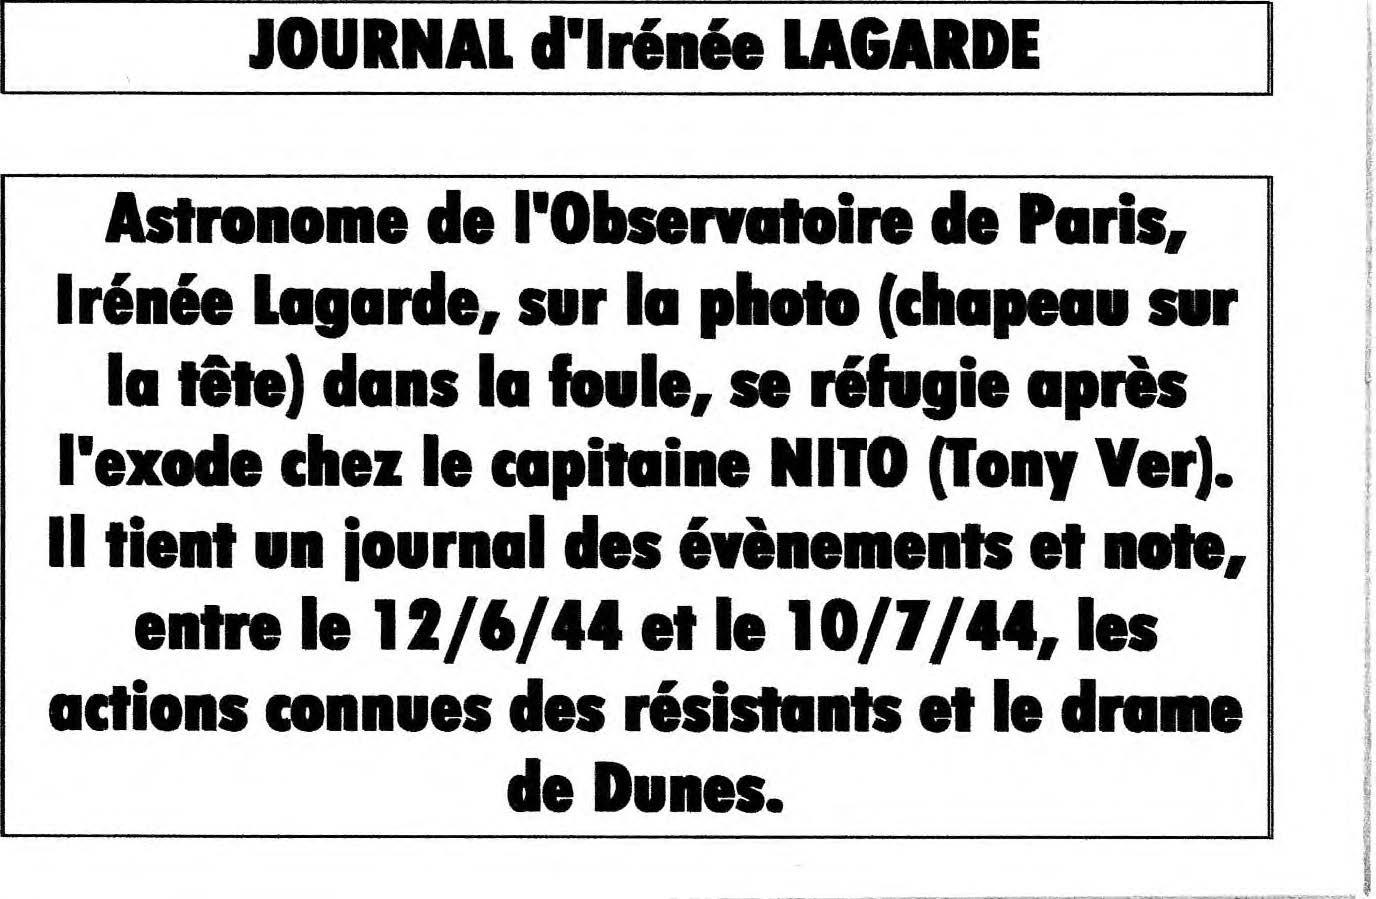 Journal d'Irénée LAGARDE